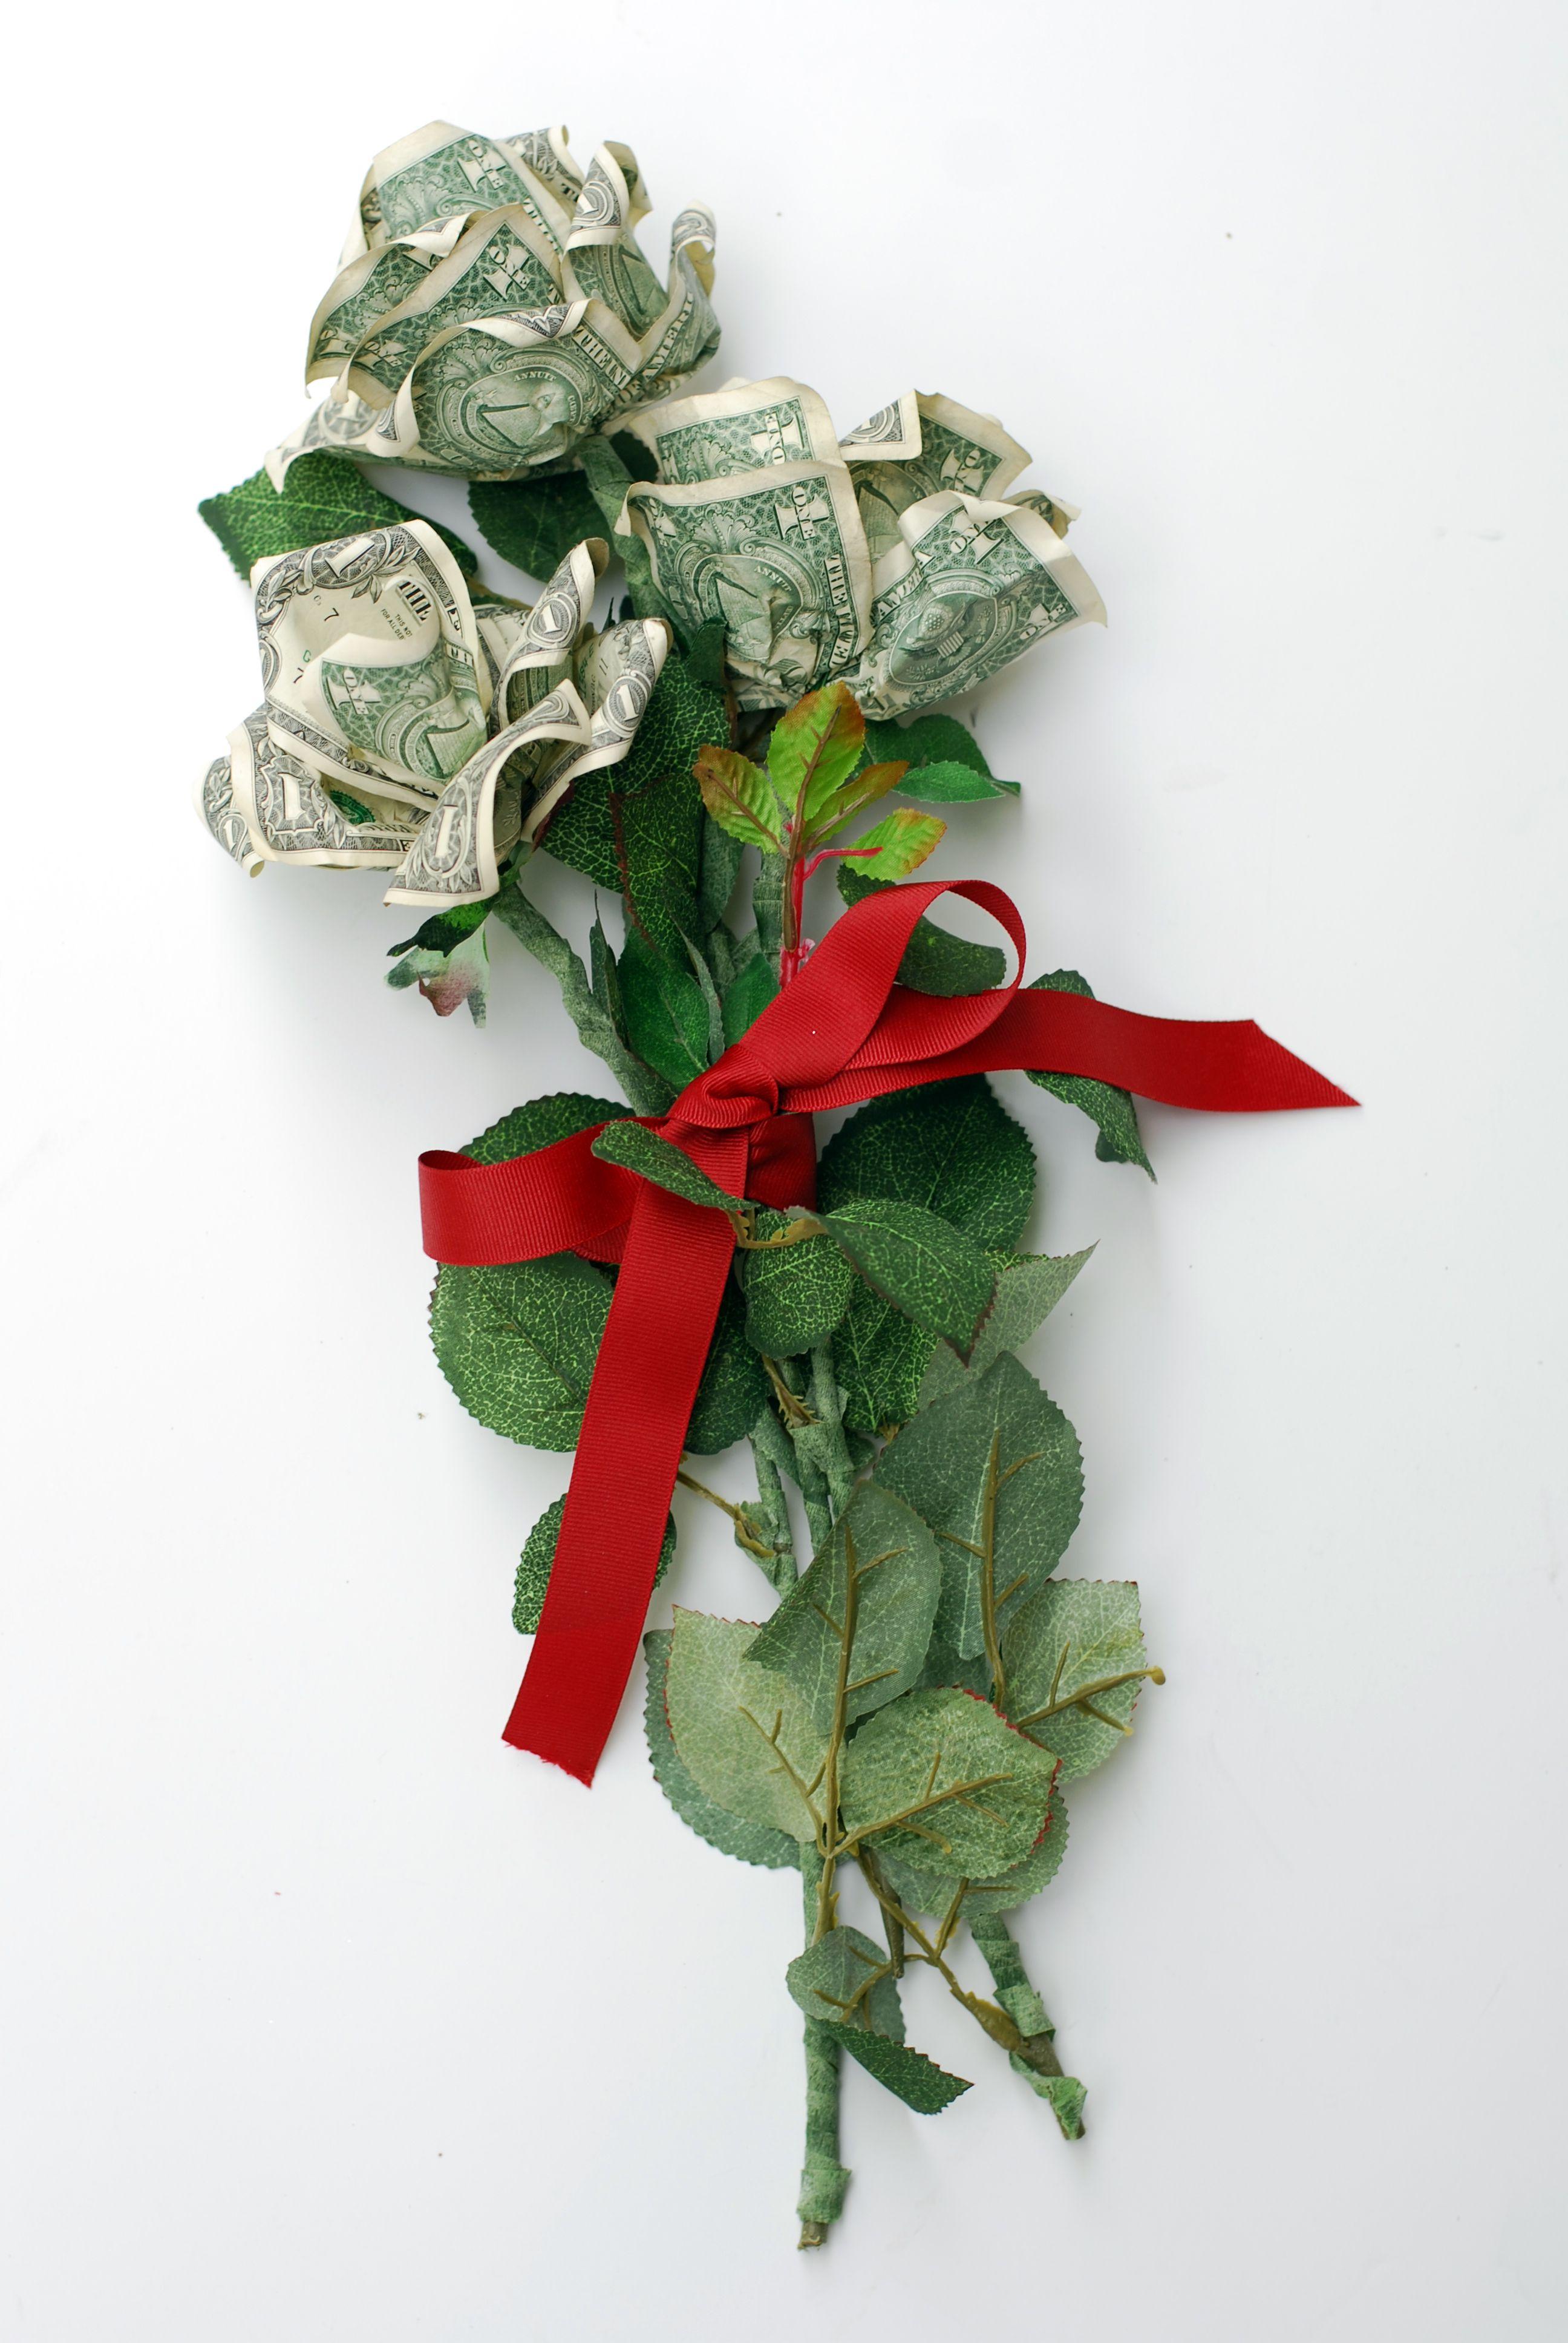 How to Make a Money Rose | FeltMagnet | 3872x2592